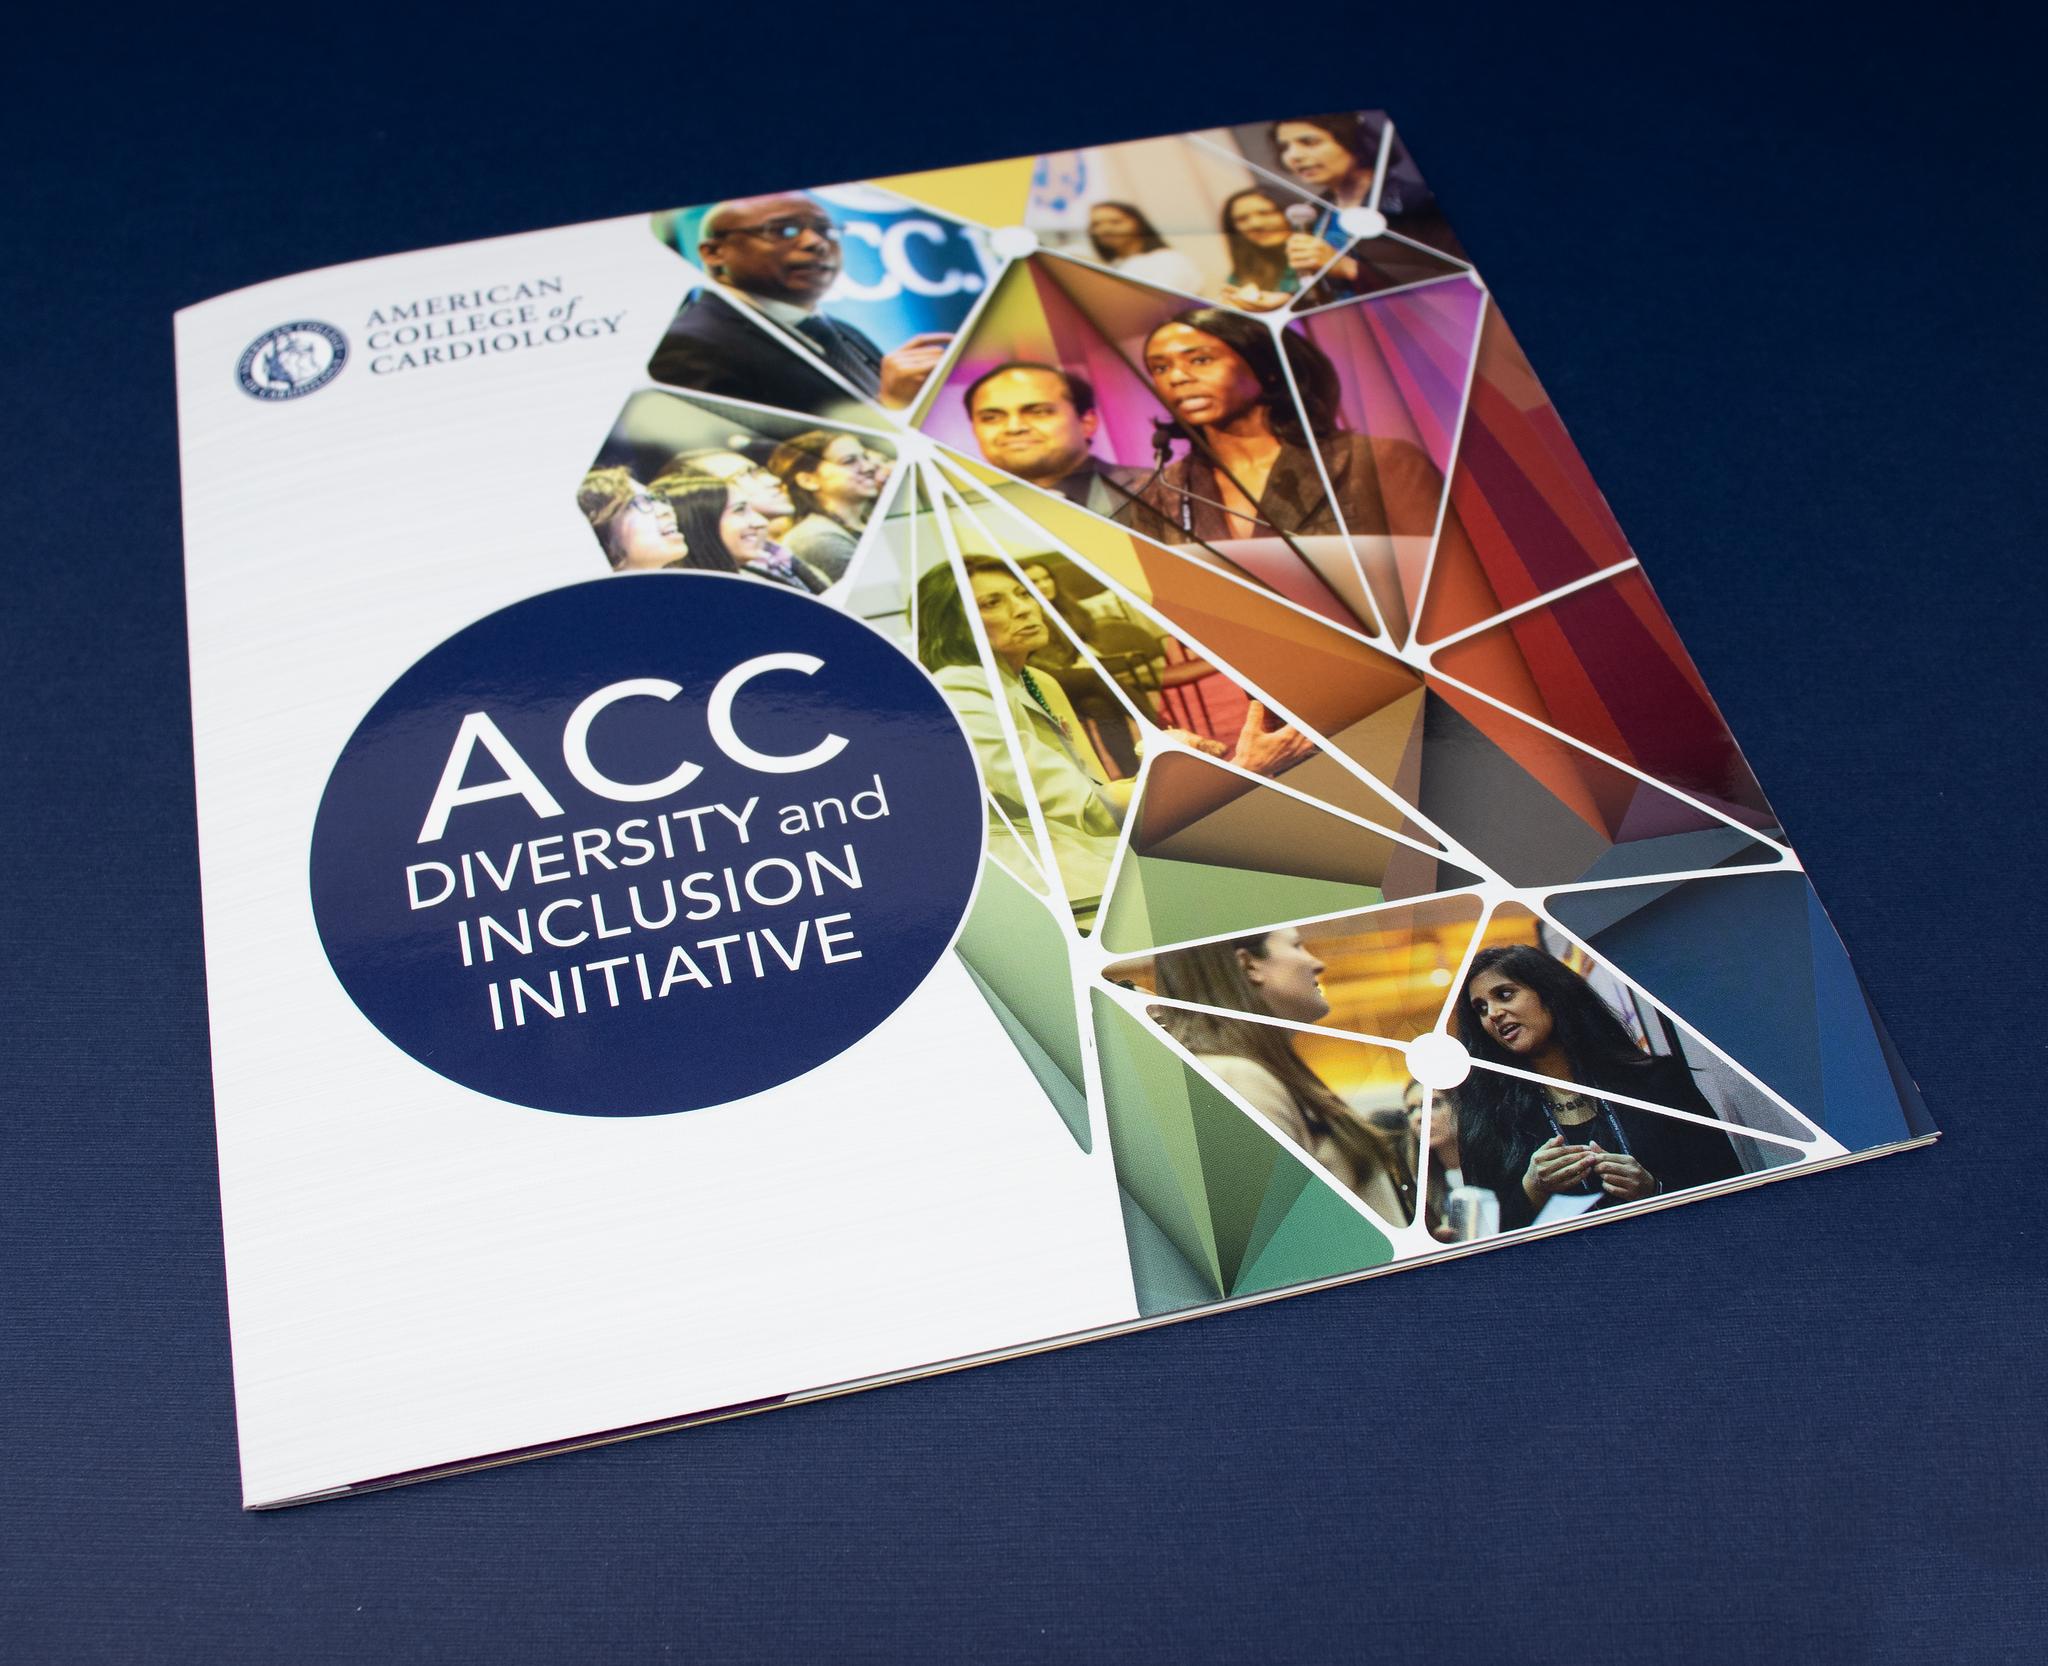 ACC Diversity & Inclusion Initiative